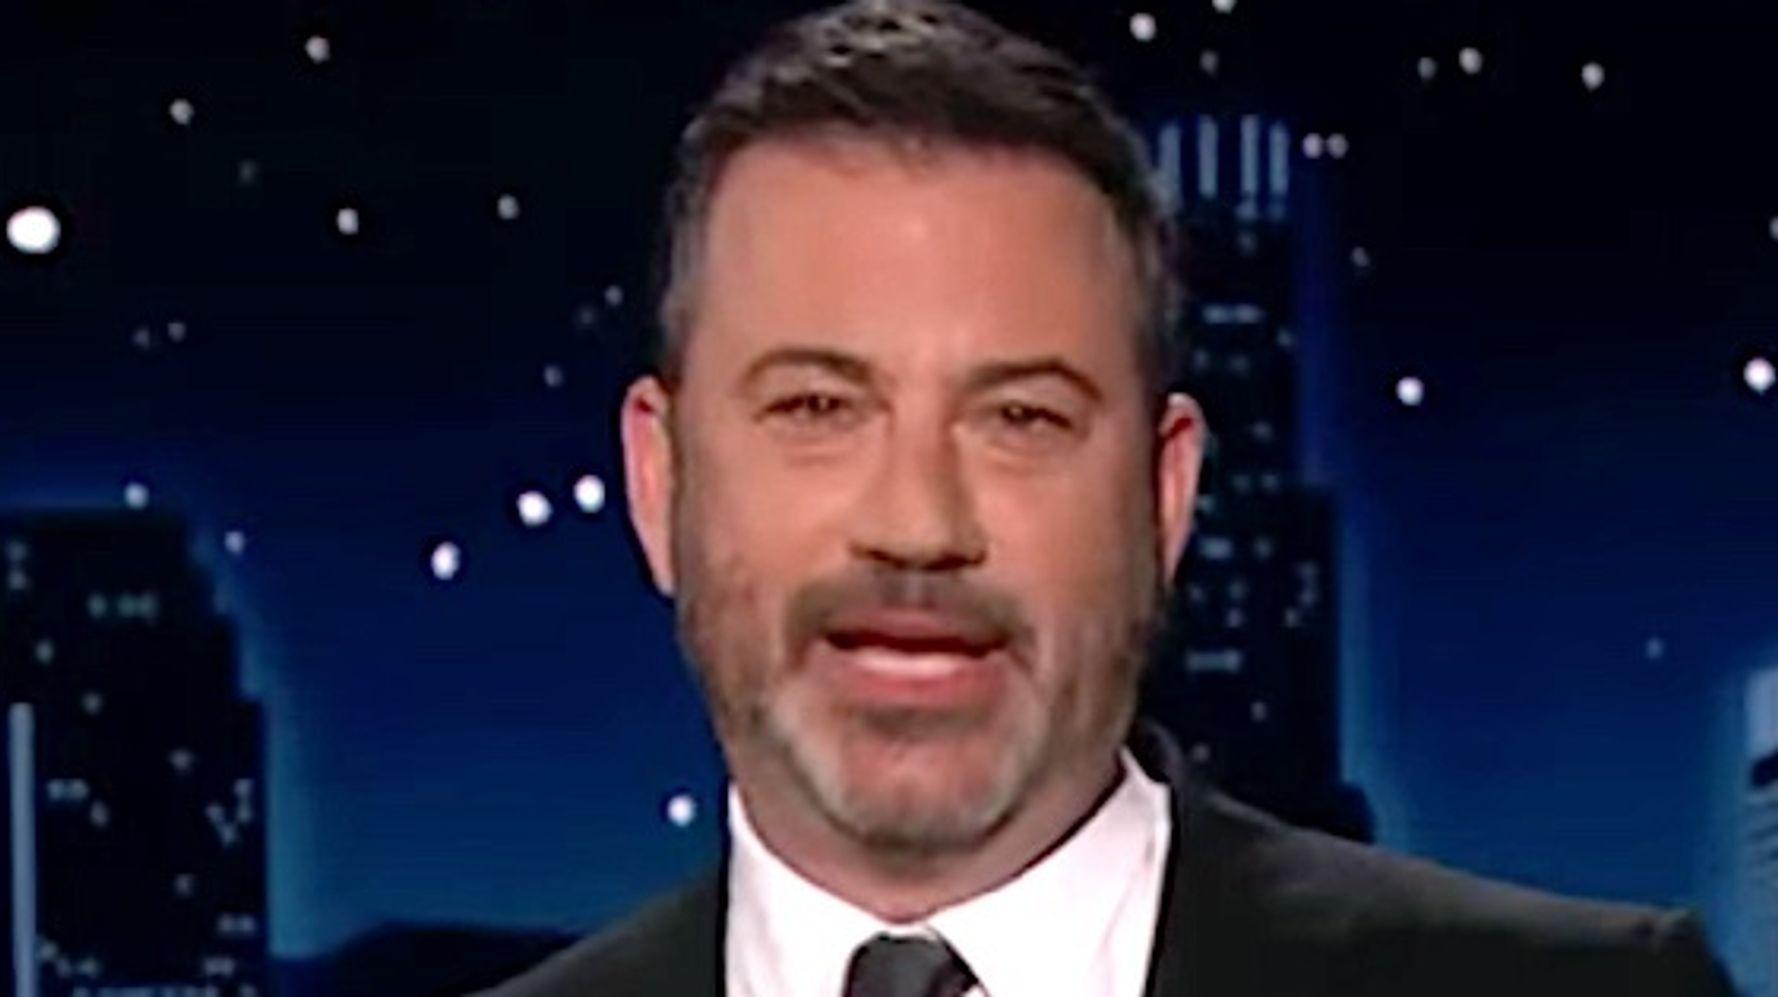 Jimmy Kimmel Gives Anti-Vaxxers A Blunt Reality Check On The Coronavirus Shot